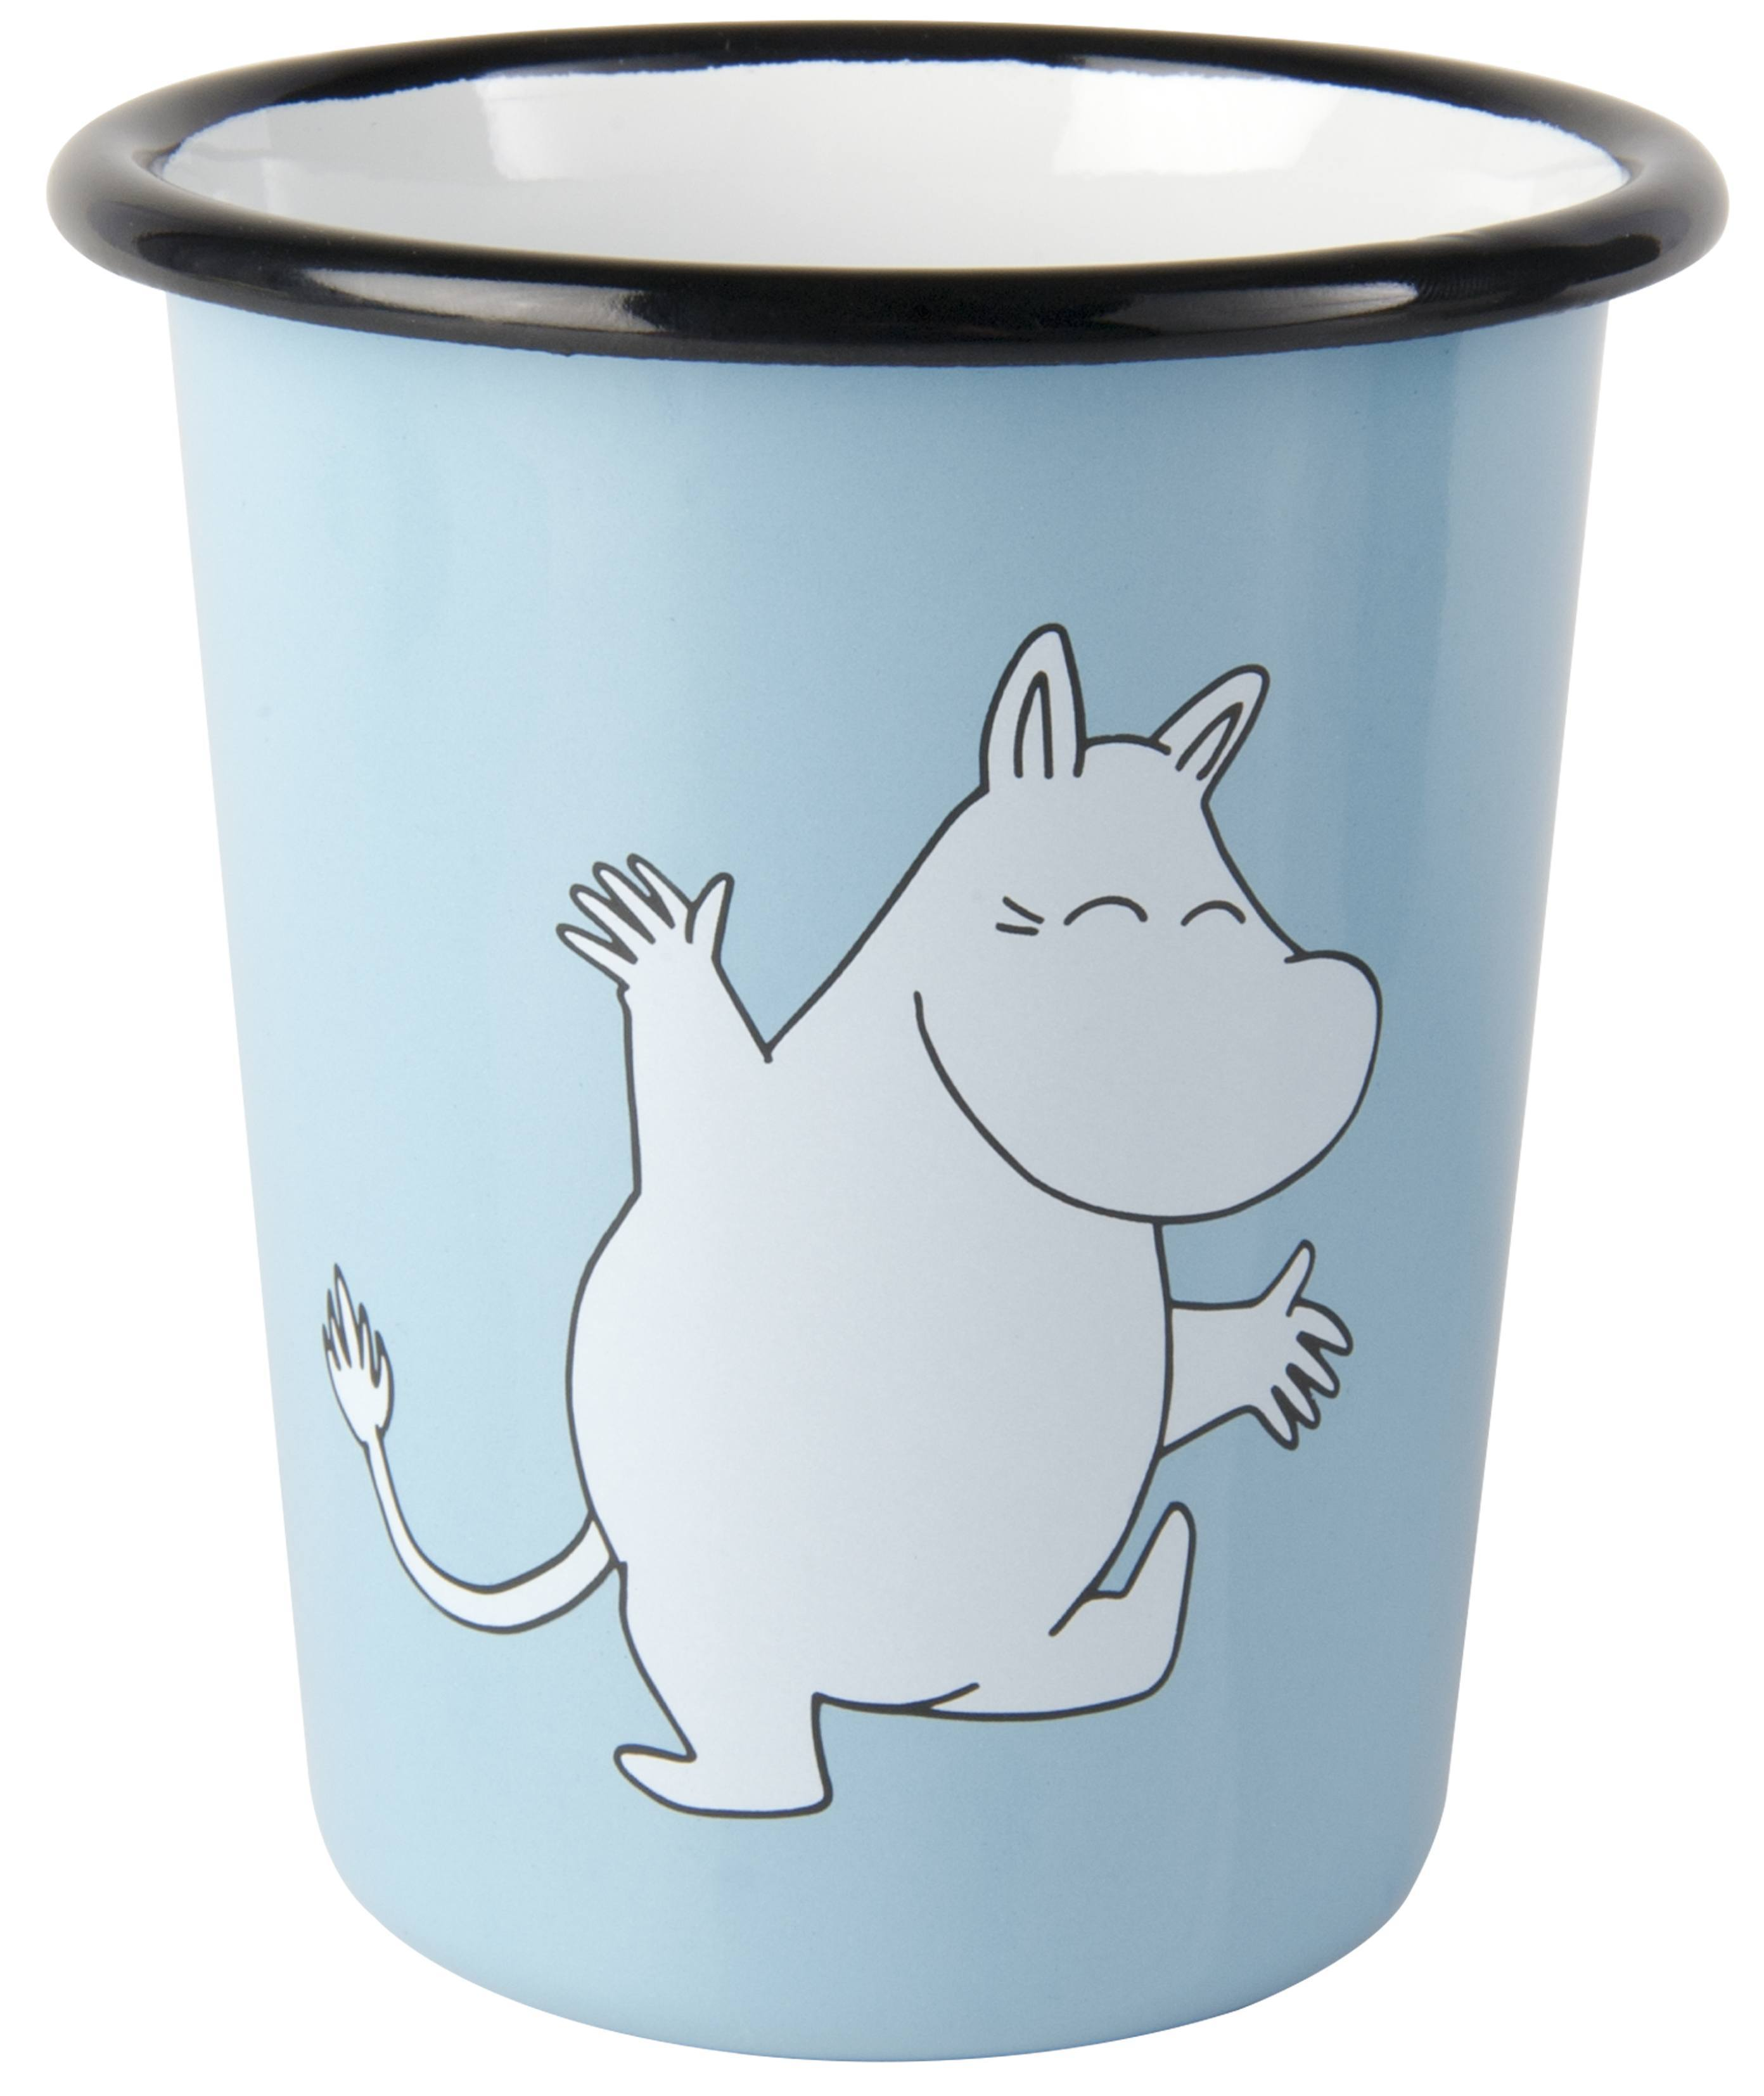 Muurla enamel tumbler 4dl Retro Moomin